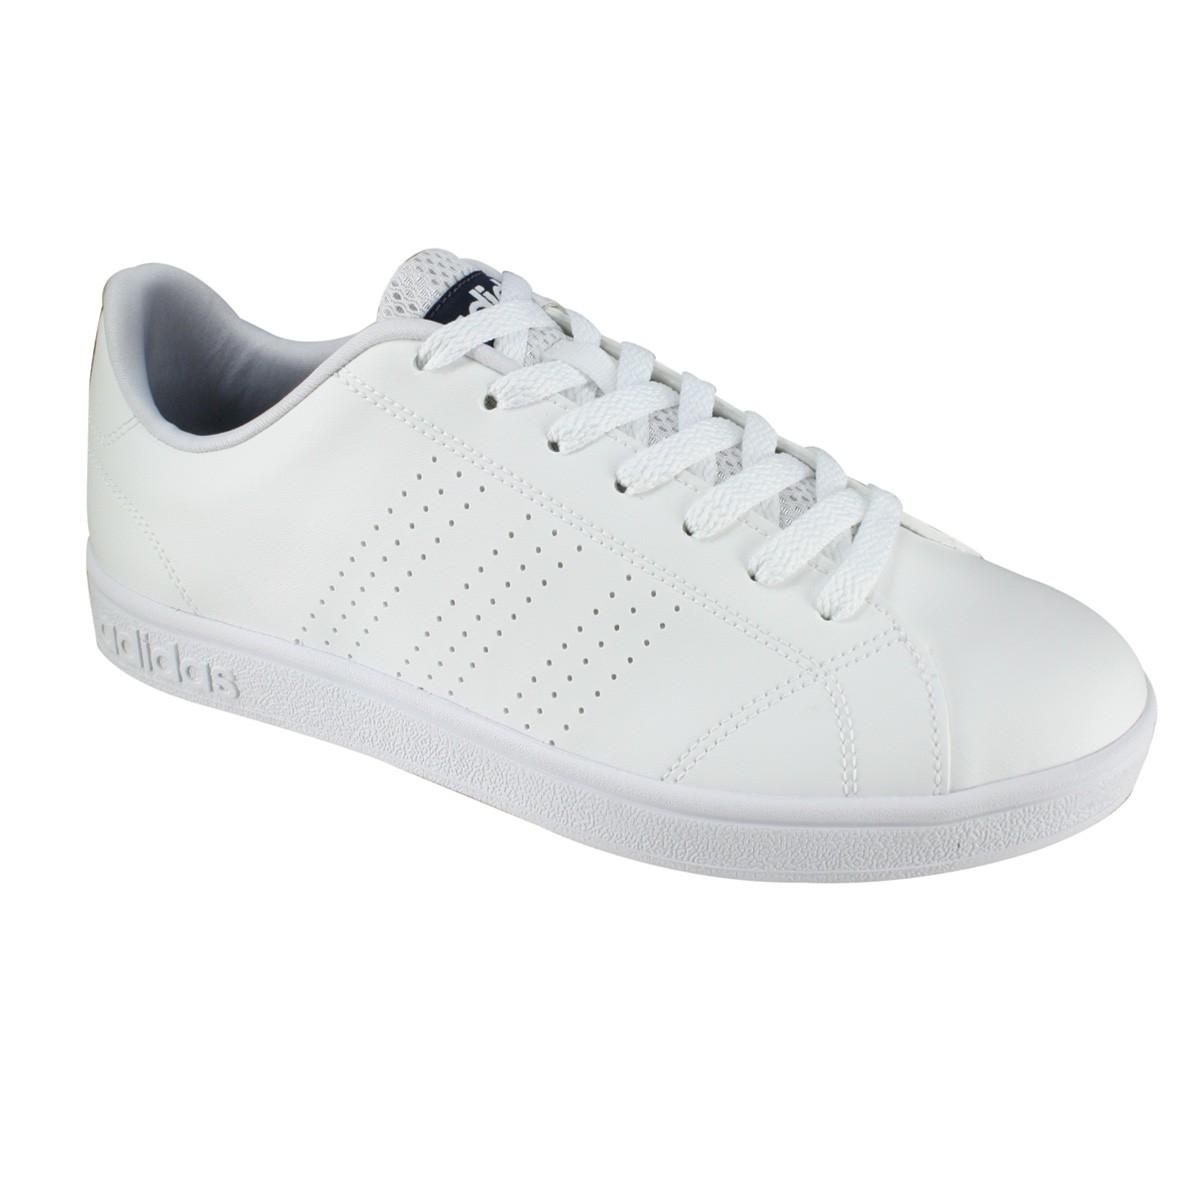 7f44478e342 Tênis Adidas Advantage Clean VS F99252 - Branco - Calçados  Online .. ... ba5ed15b668c9